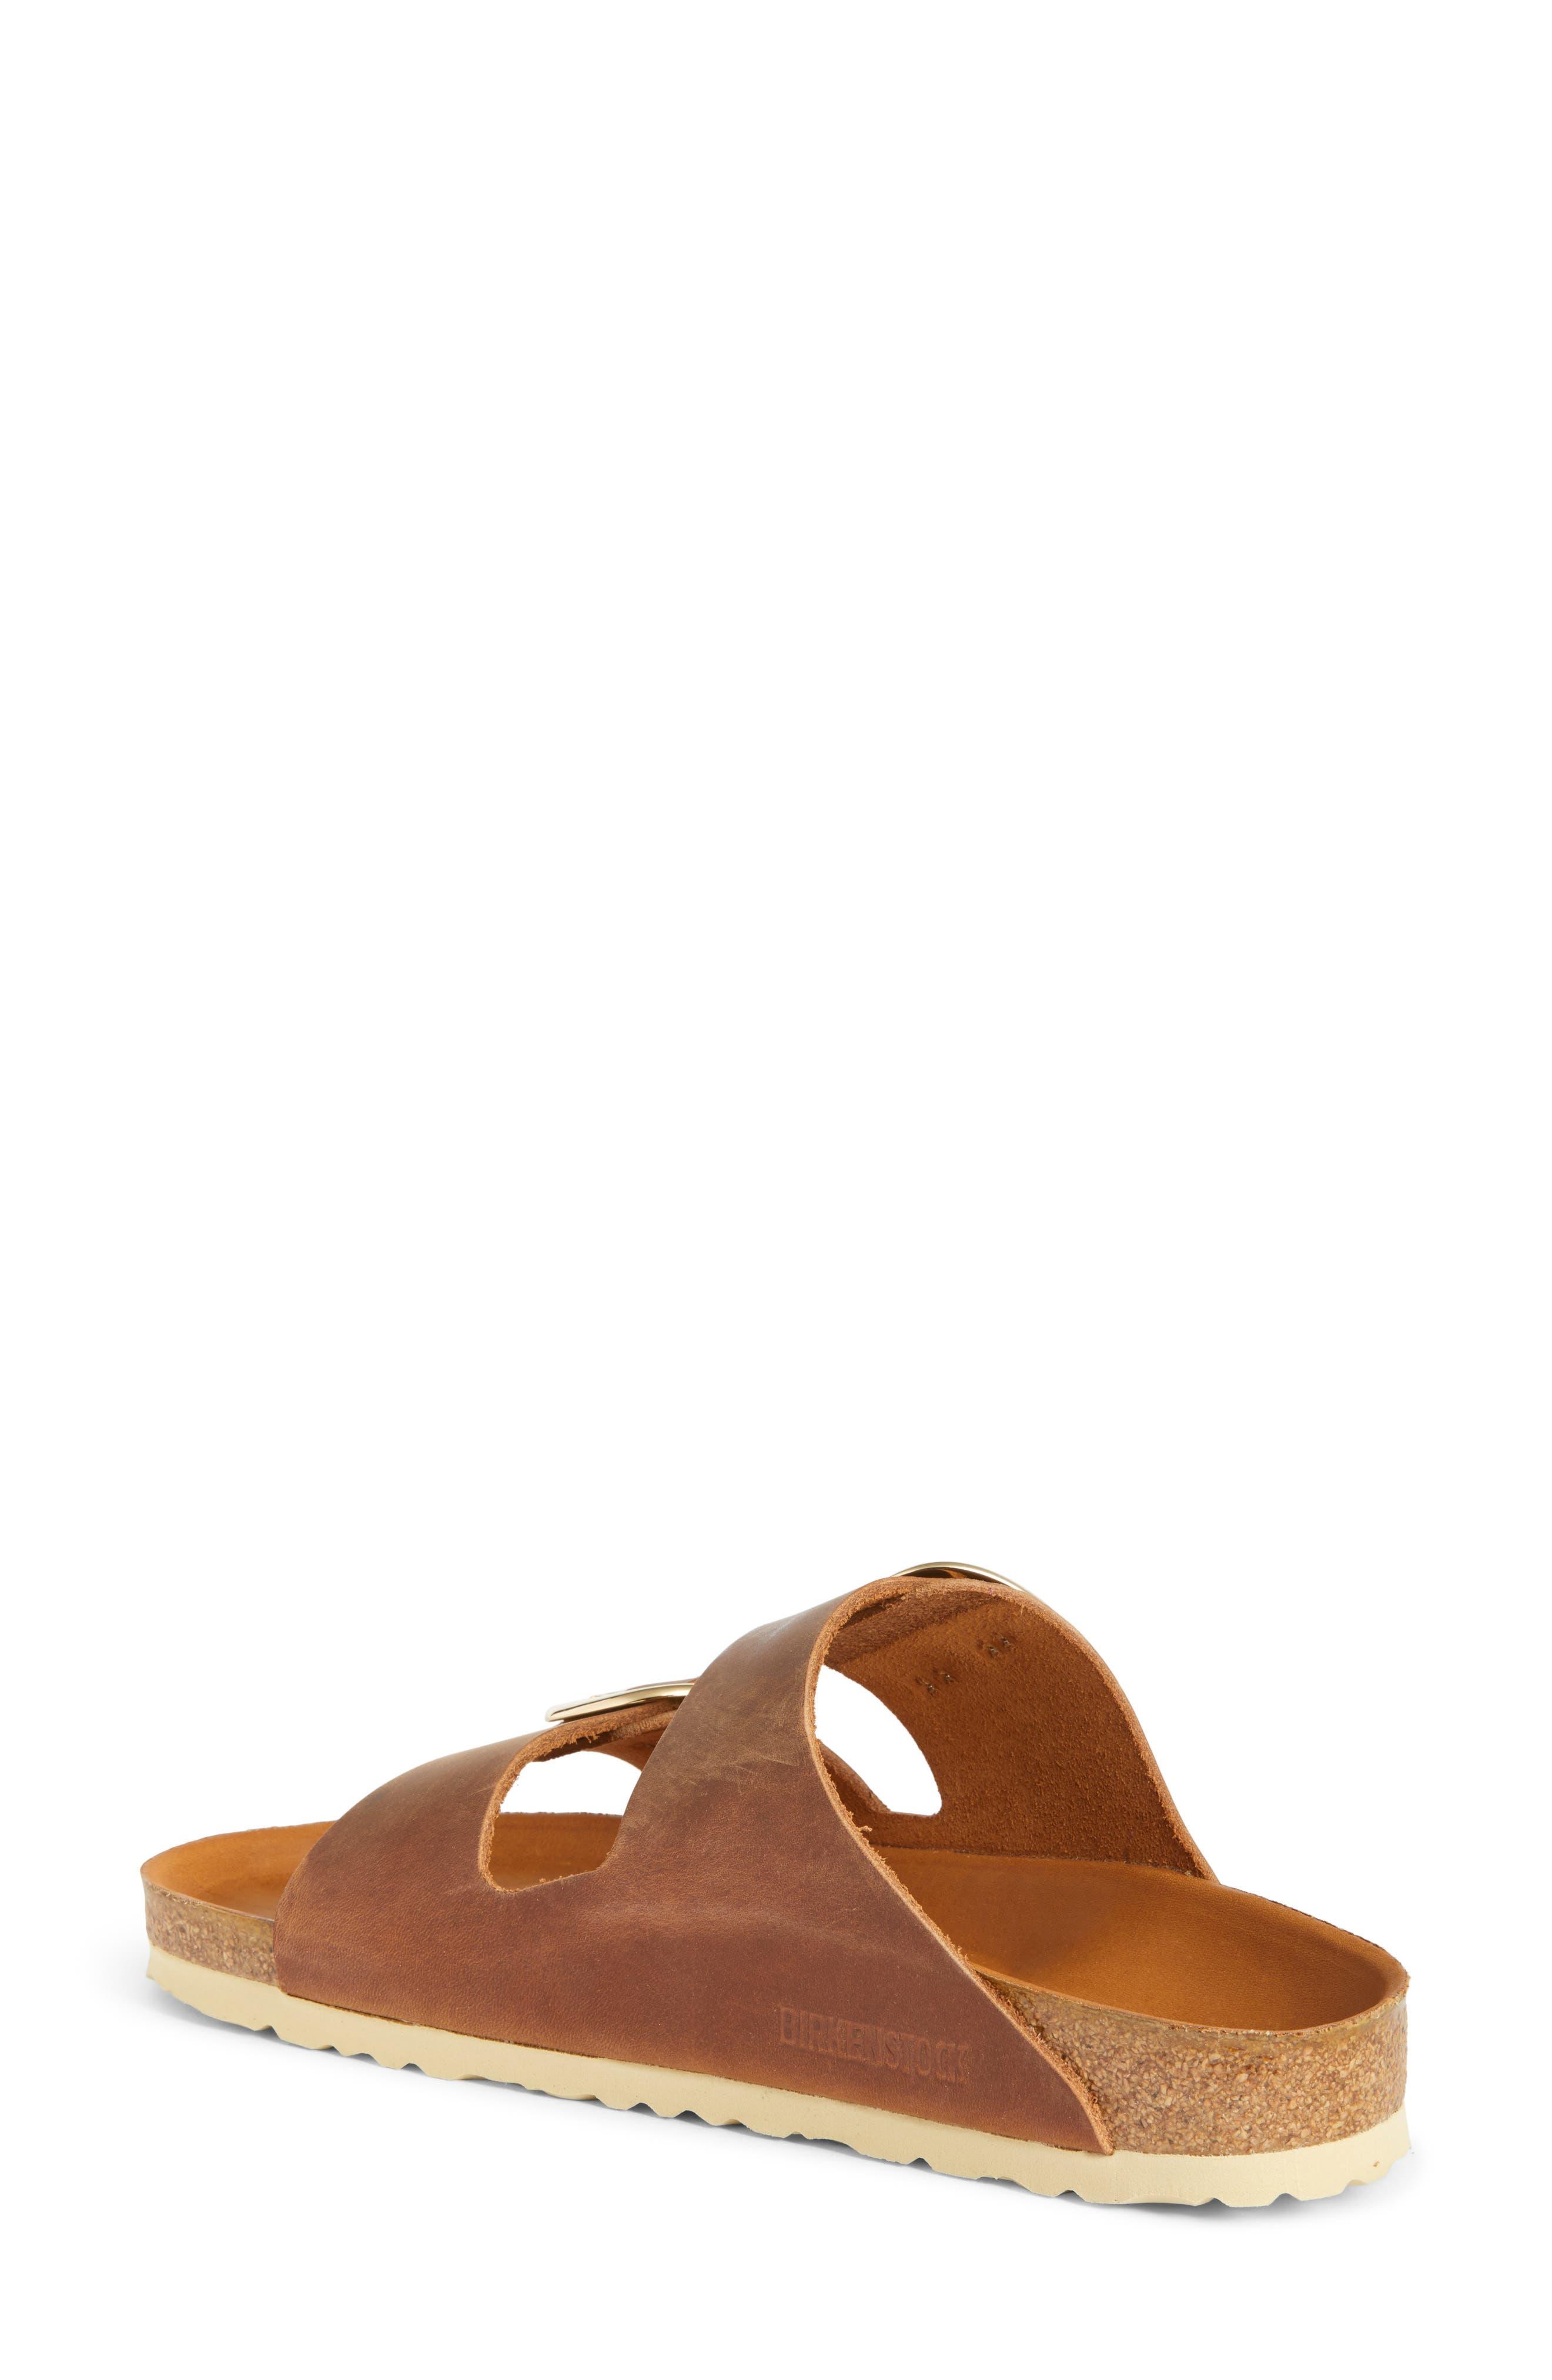 Arizona Big Buckle Slide Sandal,                             Alternate thumbnail 9, color,